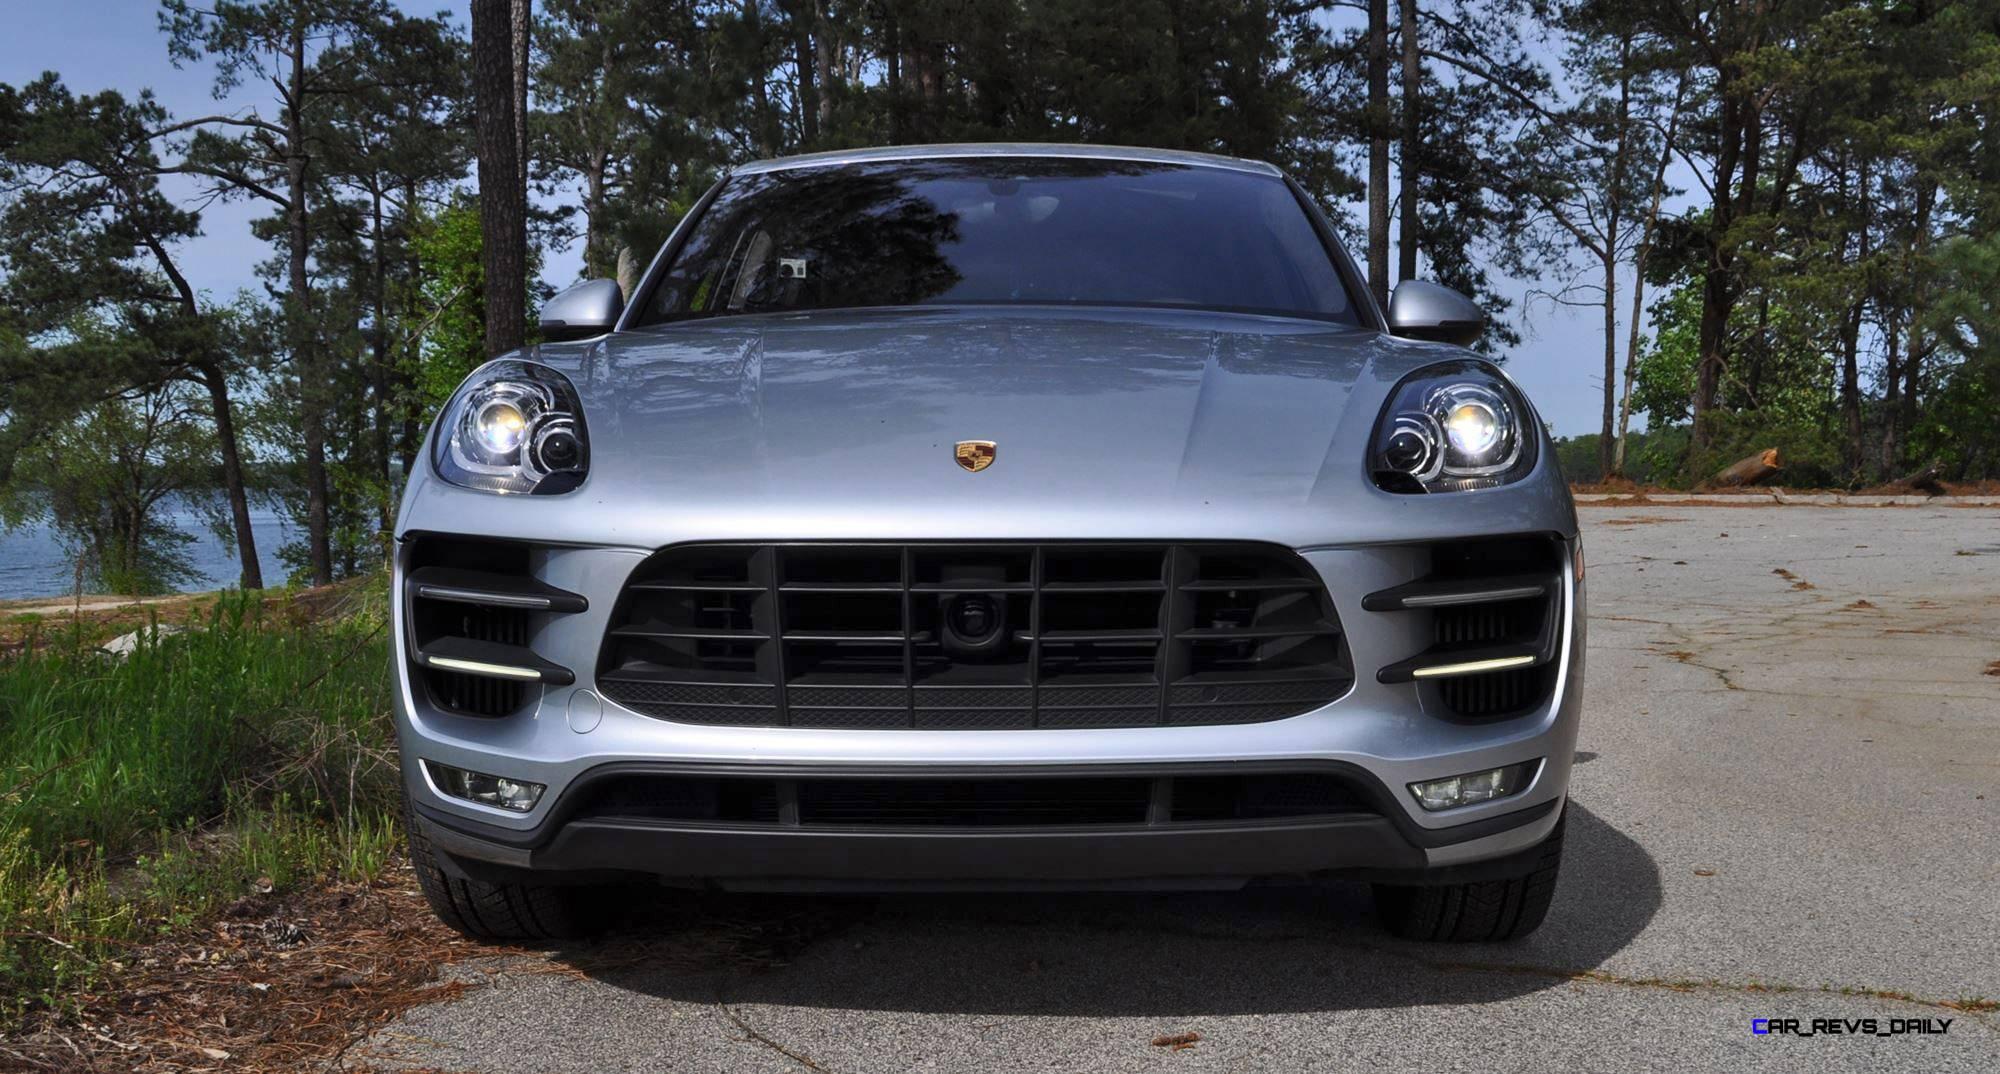 Original 2015 Porsche MACAN TURBO Review